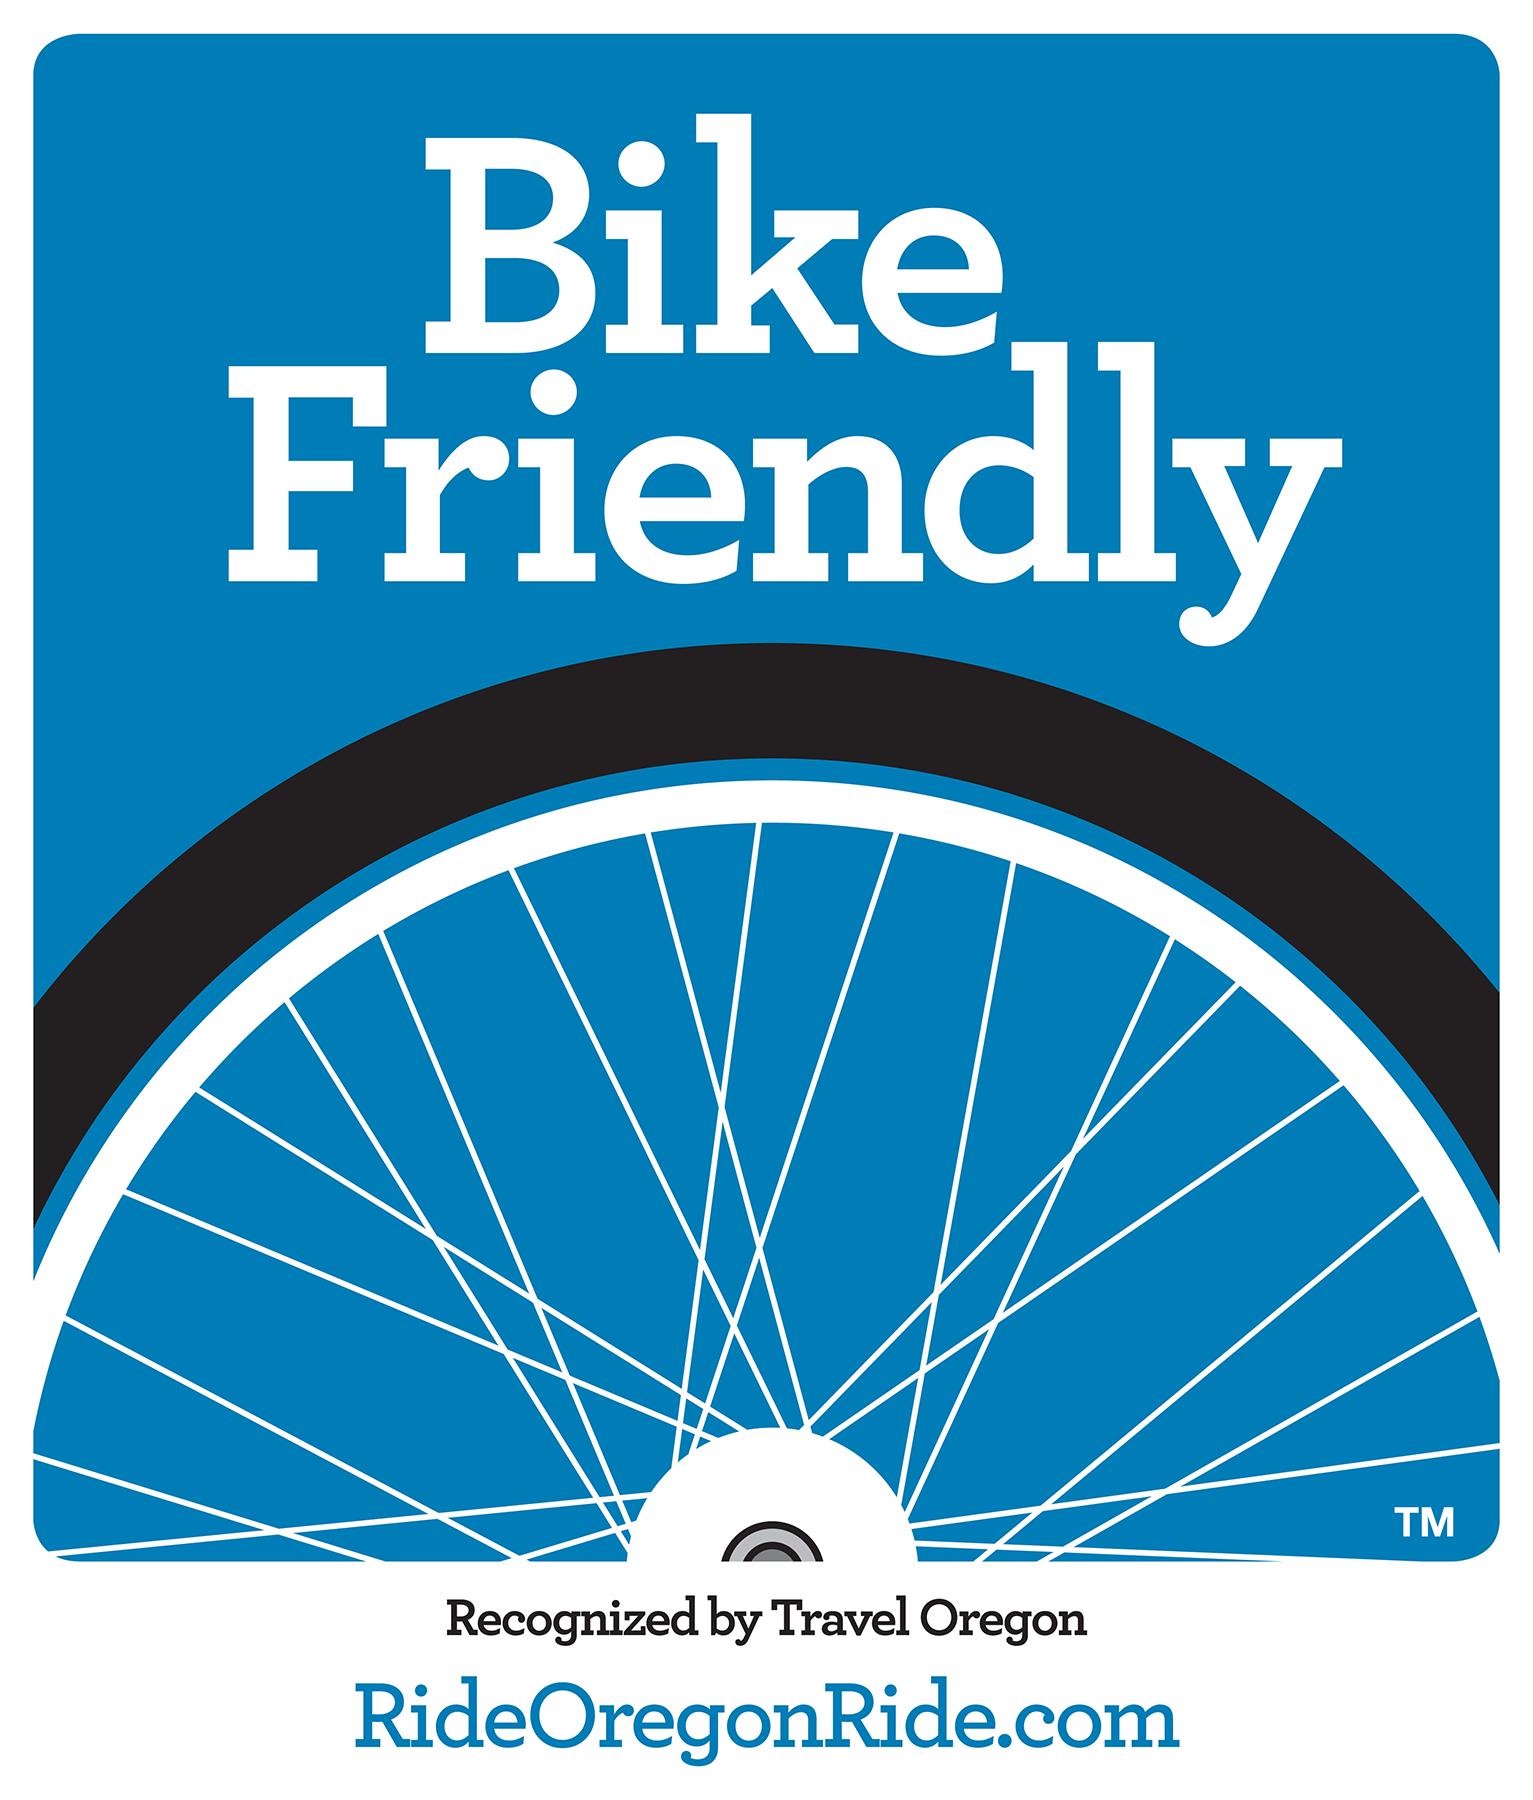 Travel Oregon Bike Friendly business